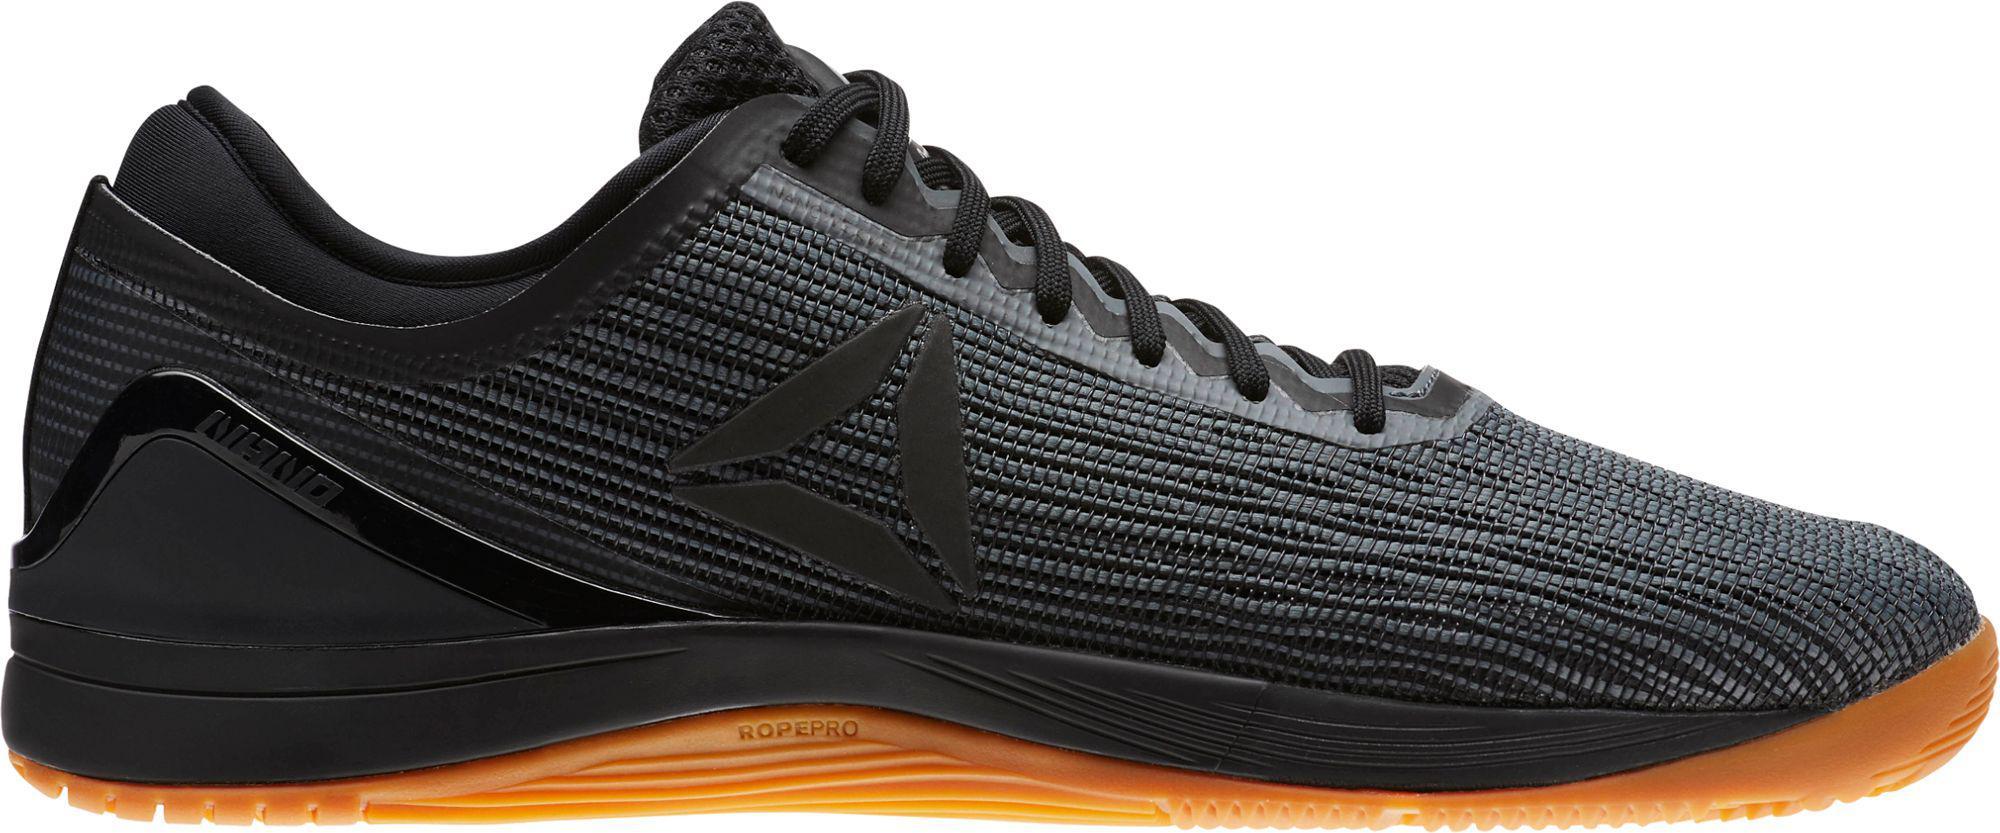 ee9ee654e27c5 Reebok - Black Crossfit Nano 8.0 Flexweave Training Shoes for Men - Lyst